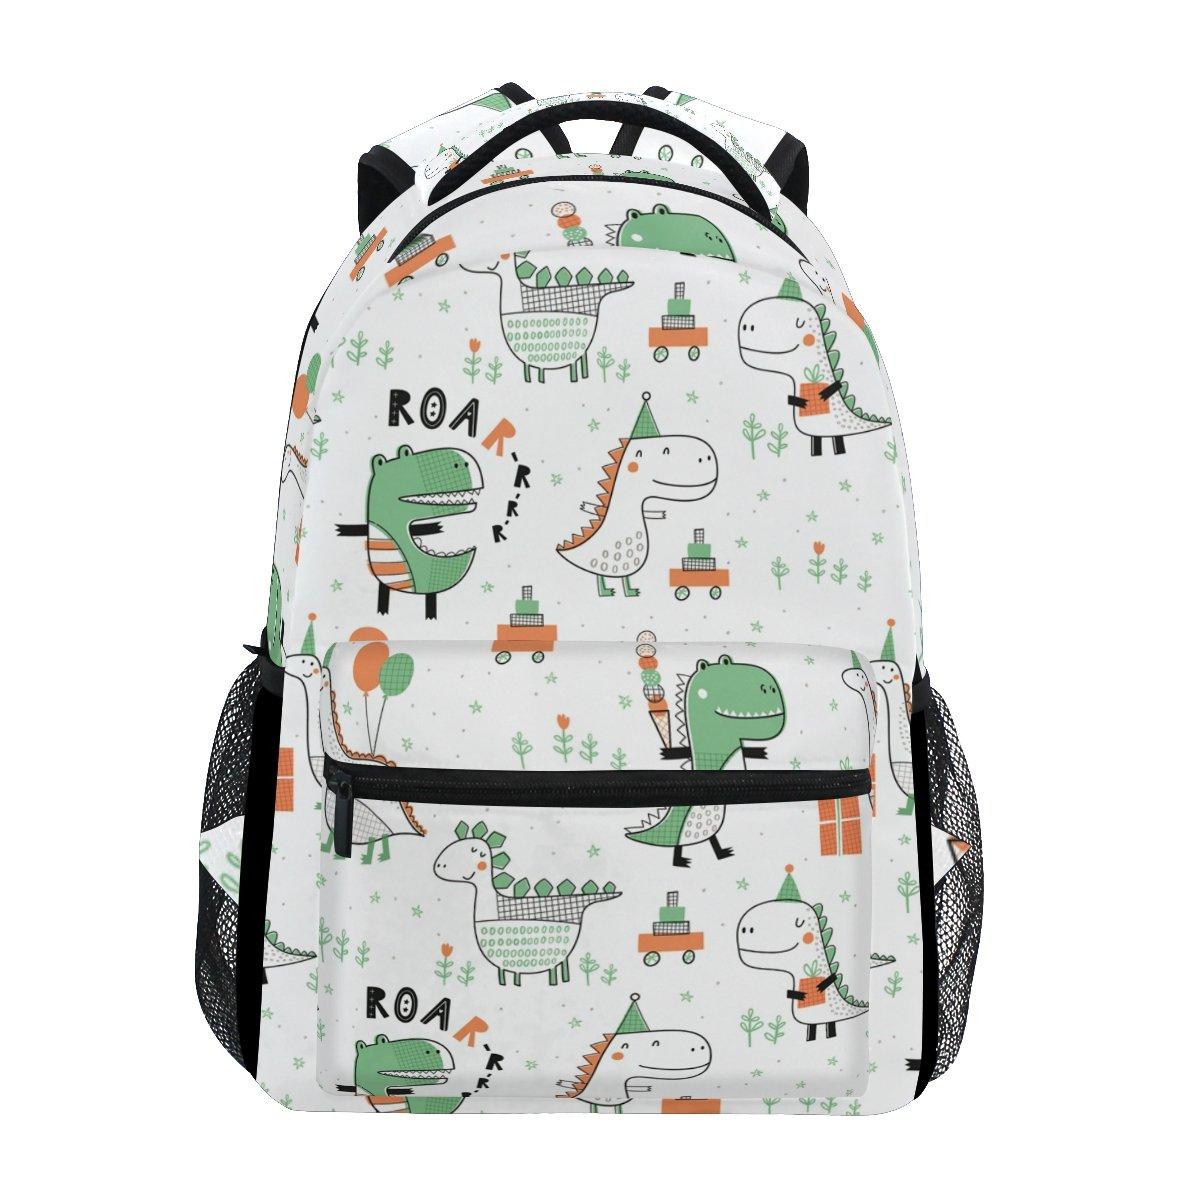 Dinosaur Laptop Backpack, Large Cute School Bookbag Lightweight Waterproof Travel Hiking Shoulder Bag Durable Computer Bag Casual Daypack for Women Men Girls Boys